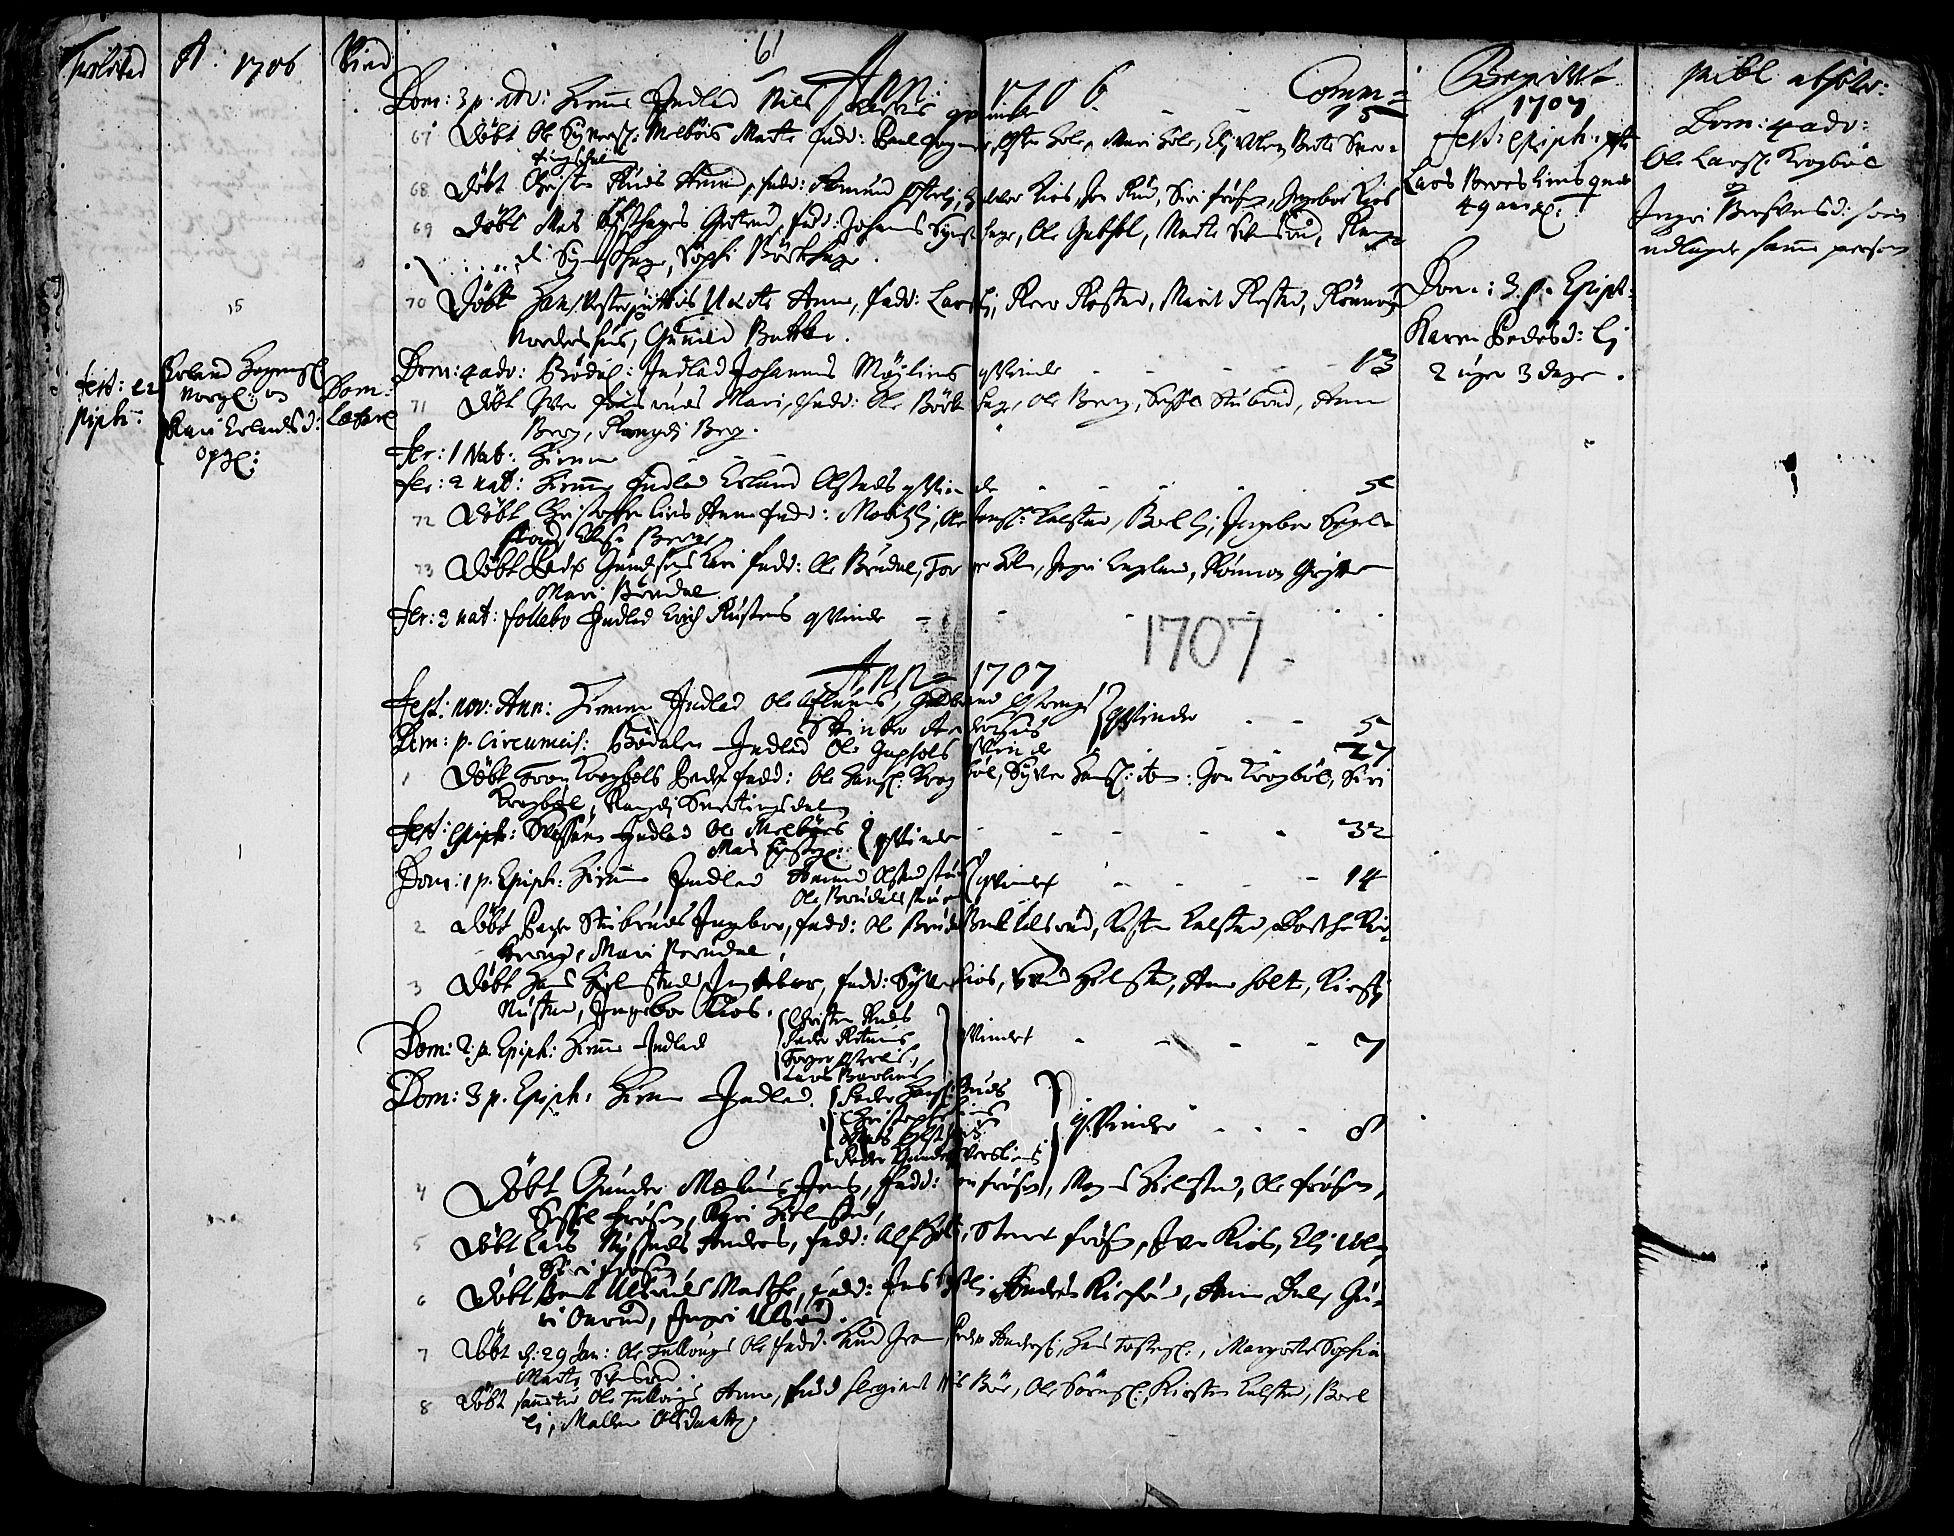 SAH, Gausdal prestekontor, Ministerialbok nr. 1, 1693-1728, s. 61